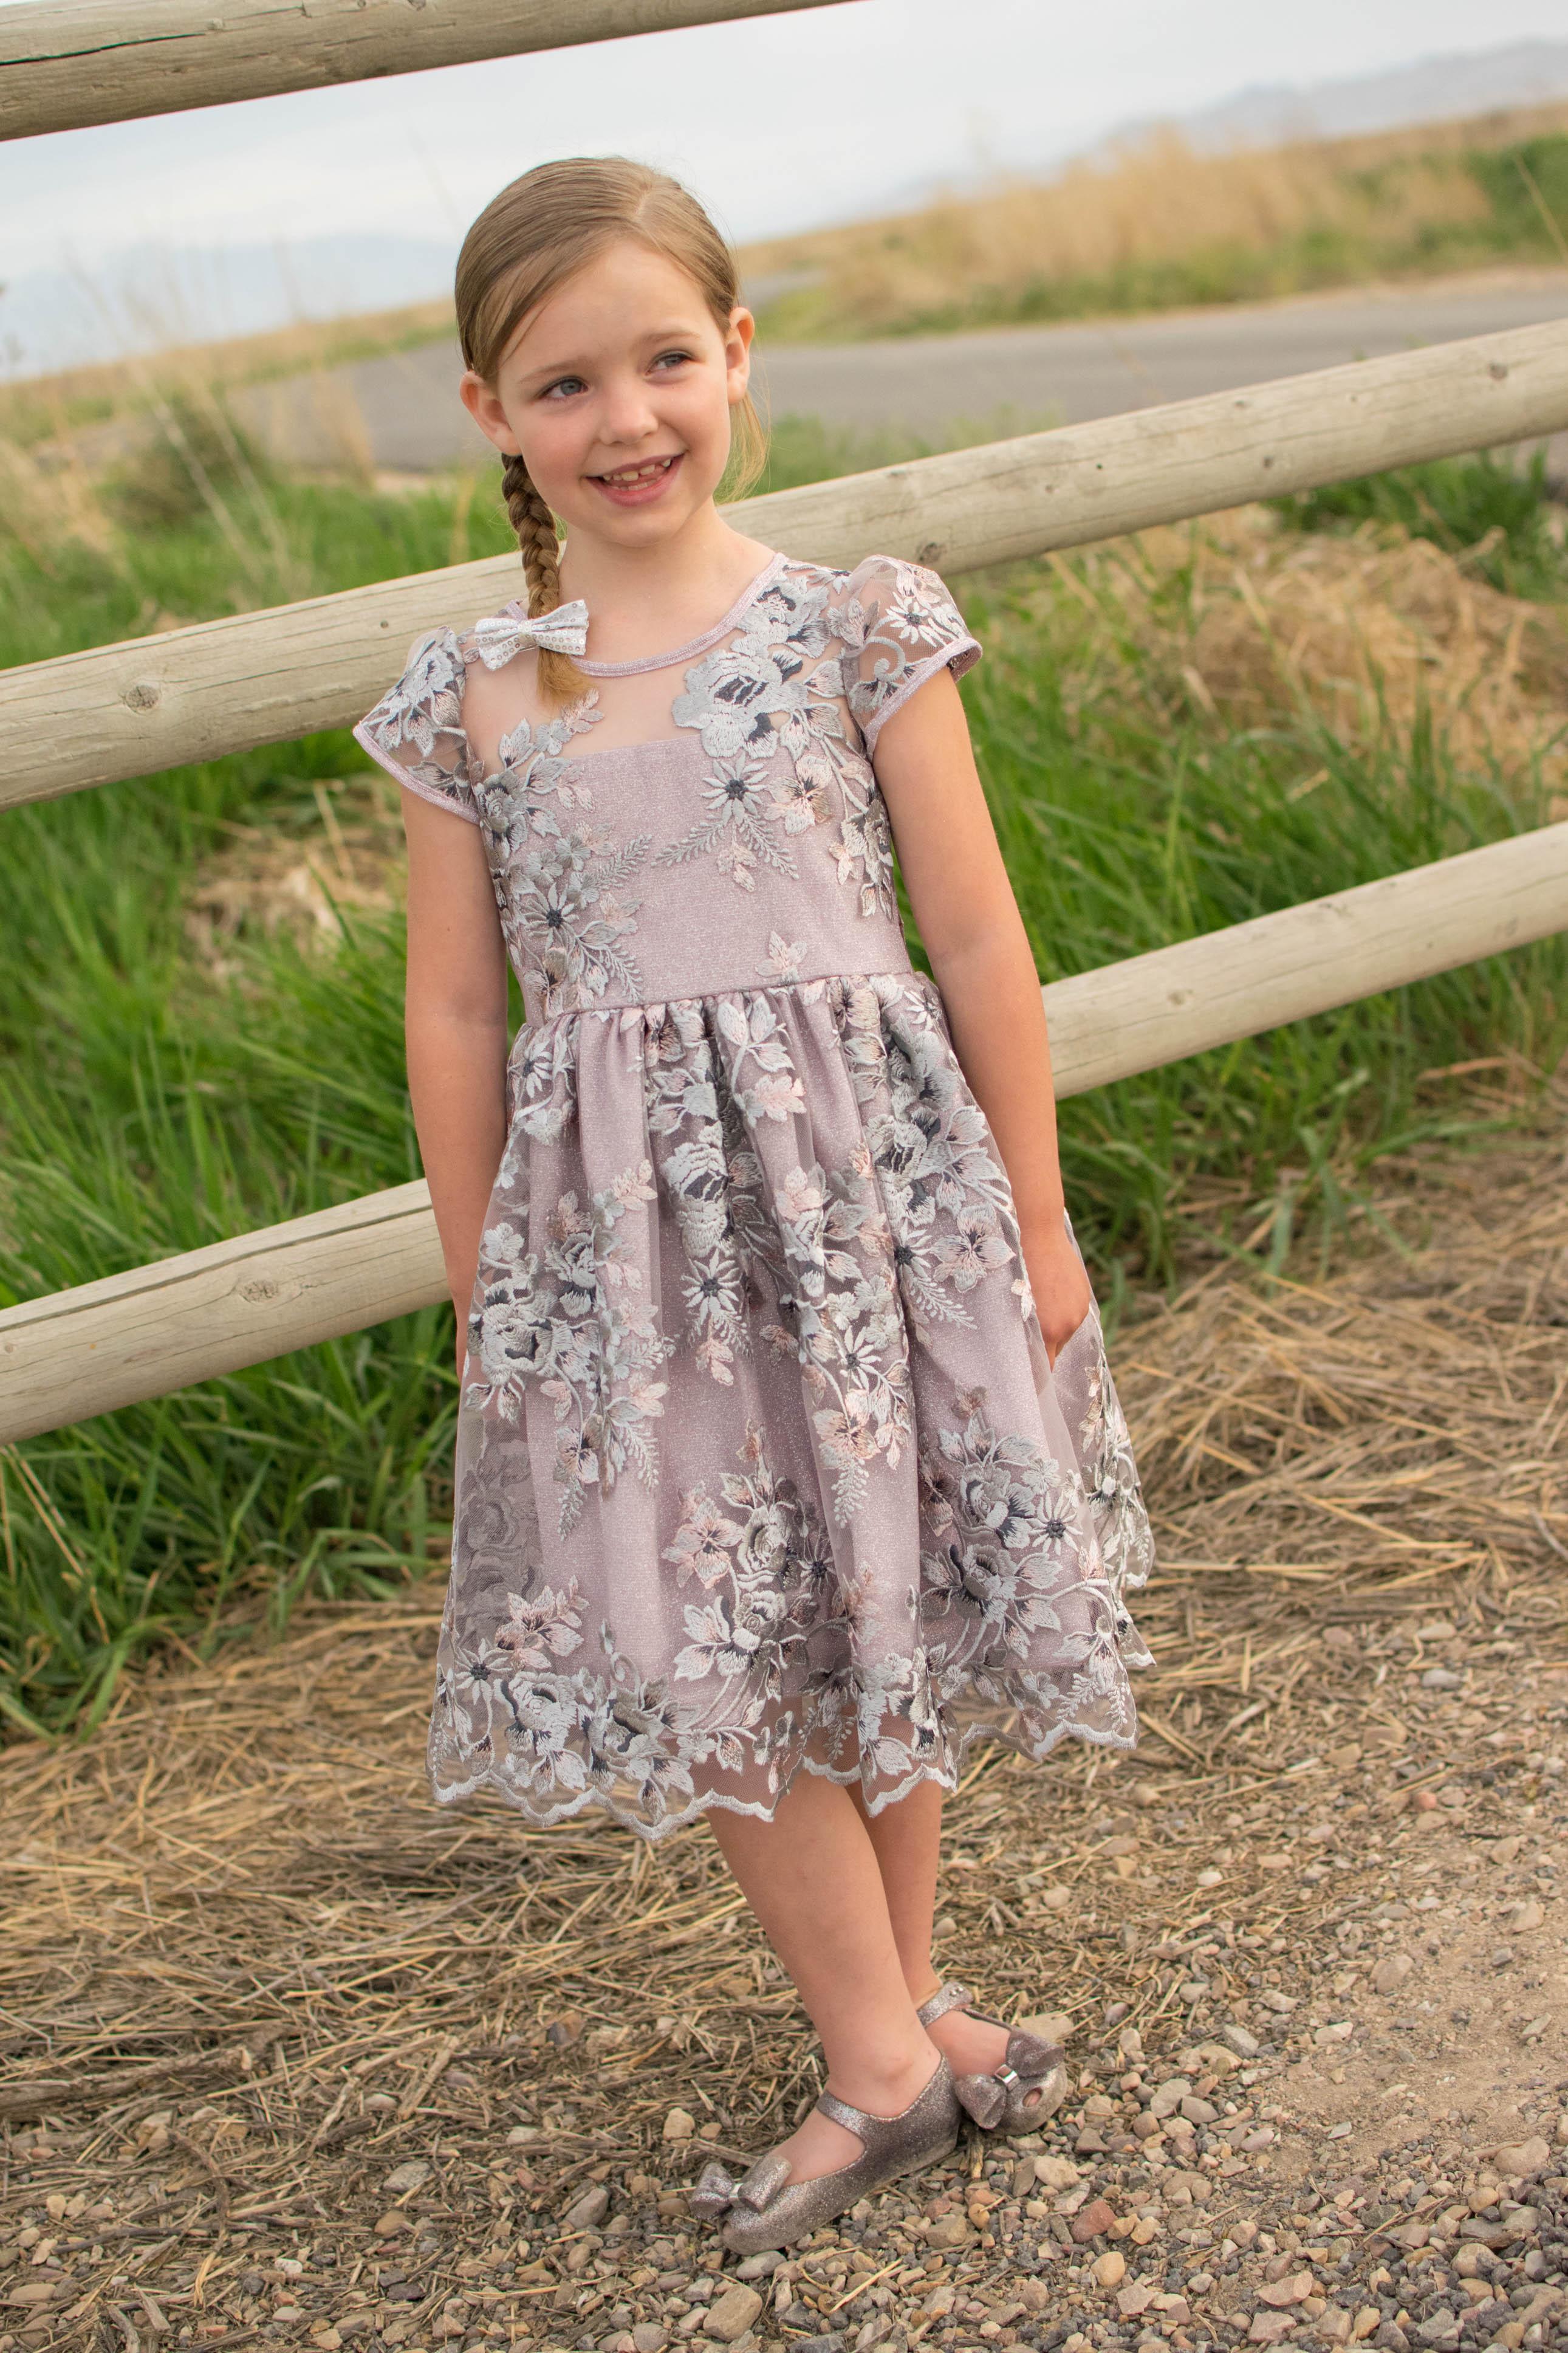 McKell's Majestic Dress Sizes 2T to 14 Kids  PDF Pattern